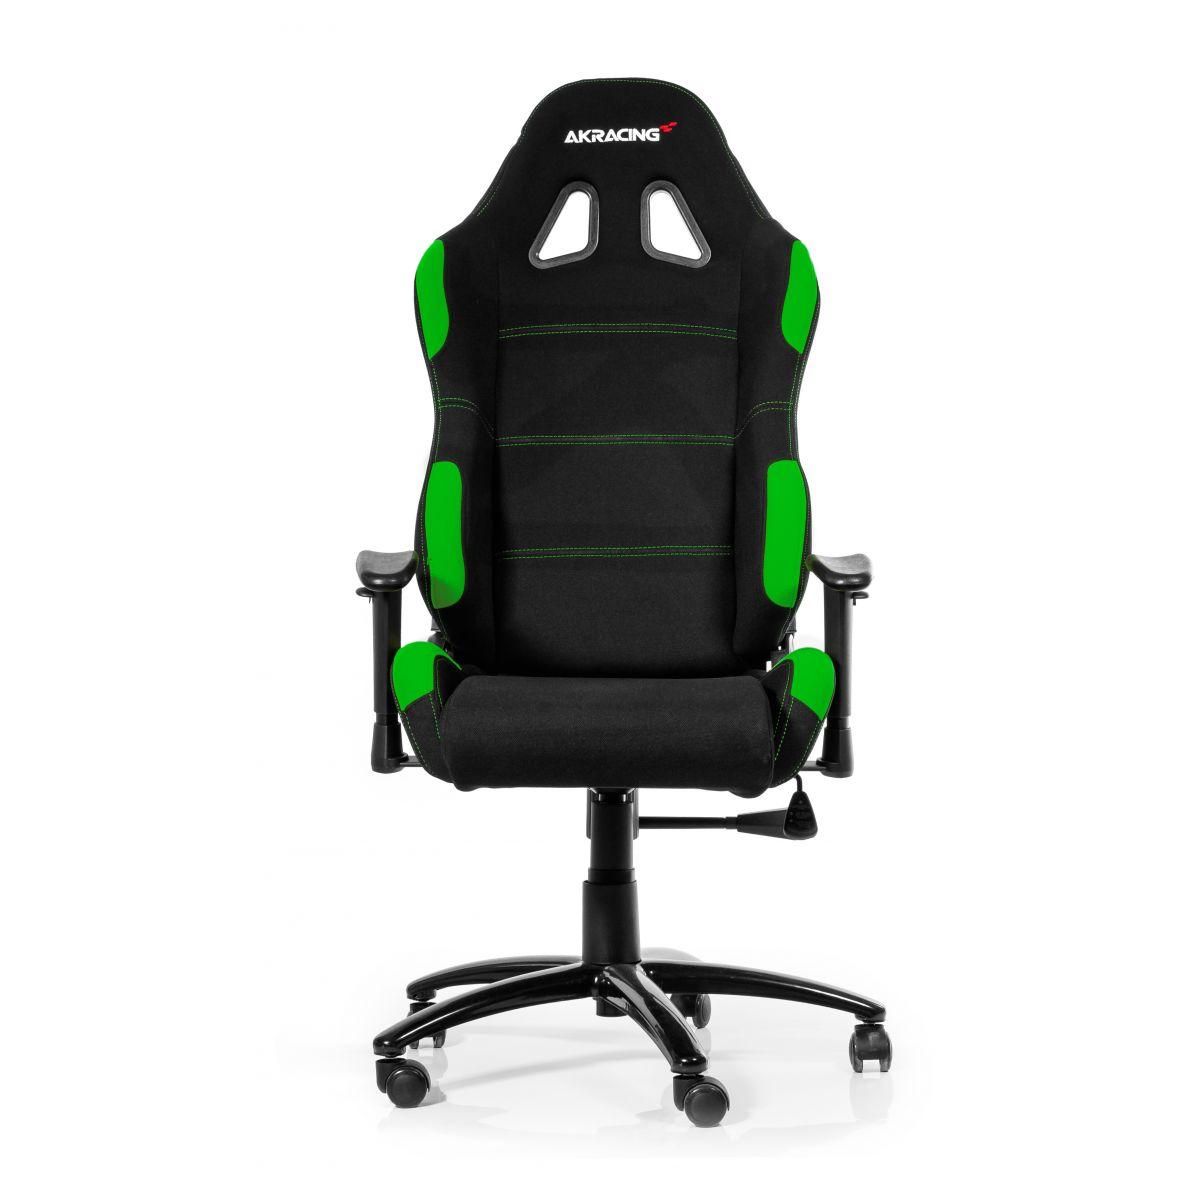 Cadeira AKRacing Gaming AK-K7012-BG Black/Green - AKRacing